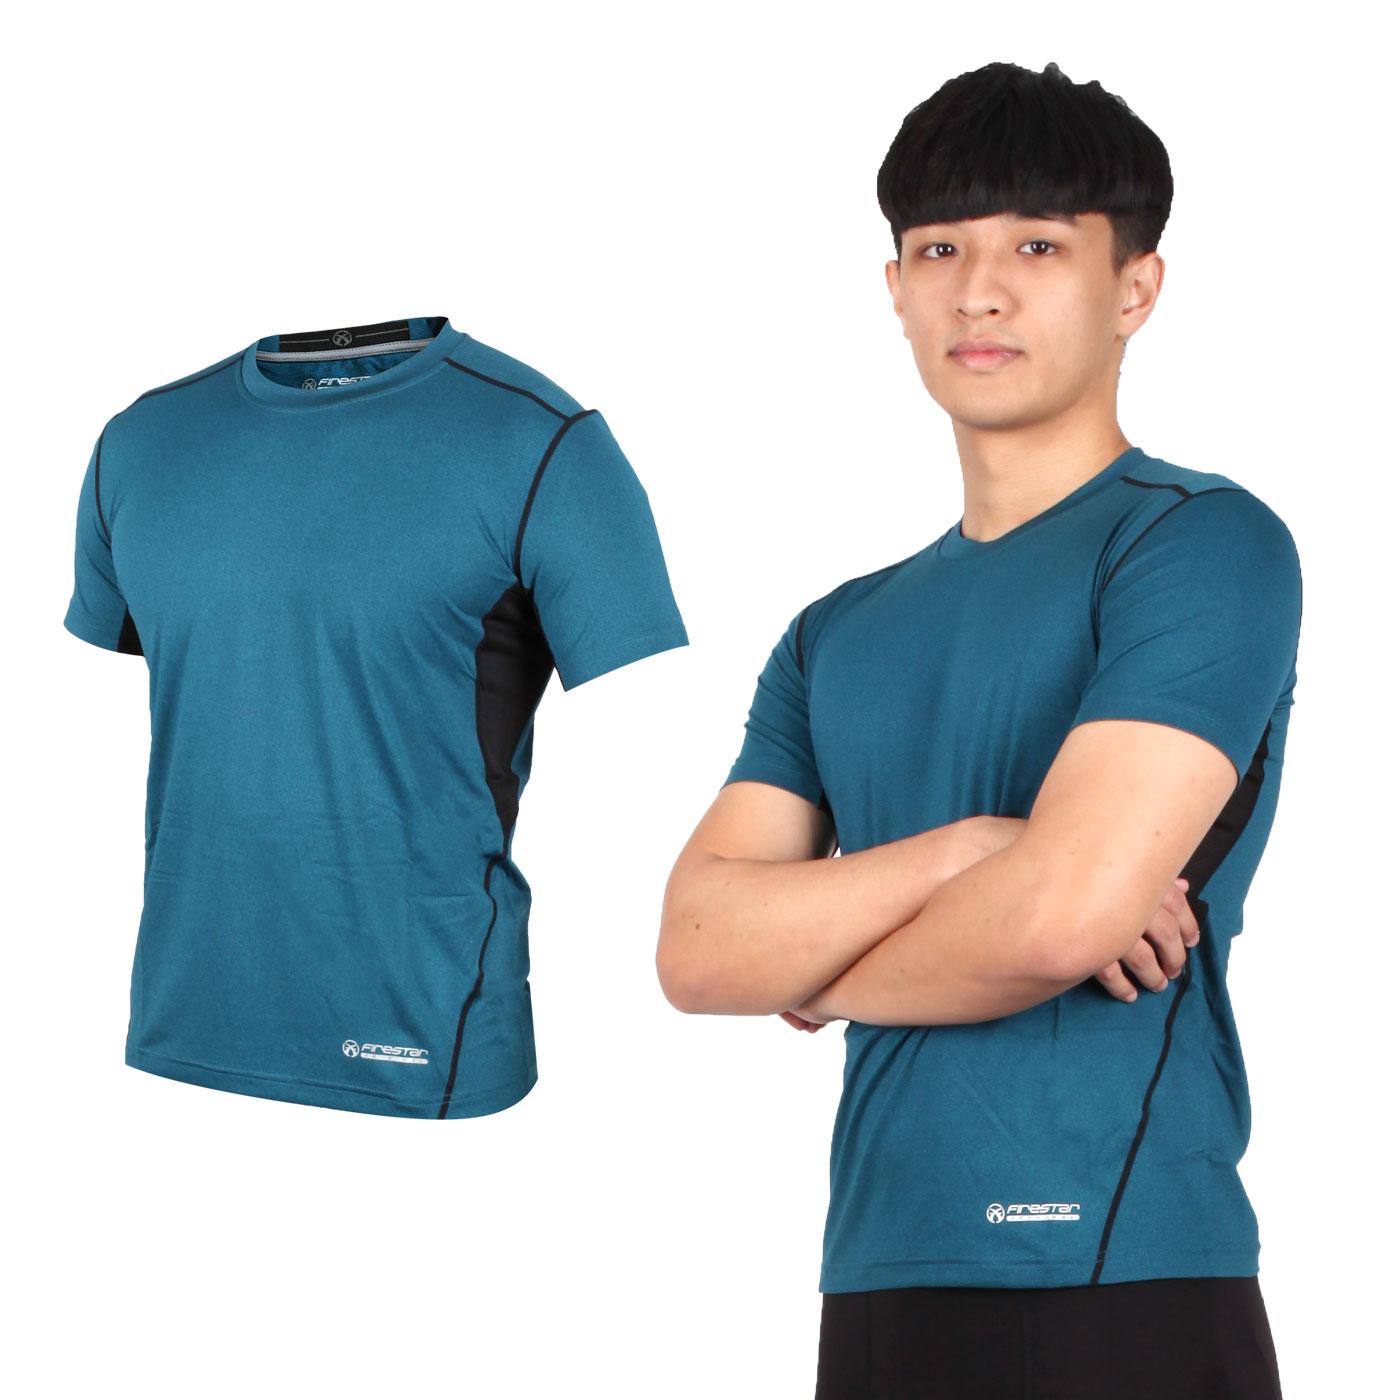 FIRESTAR 男款機能緊身短袖上衣 N7910-98 - 藍綠